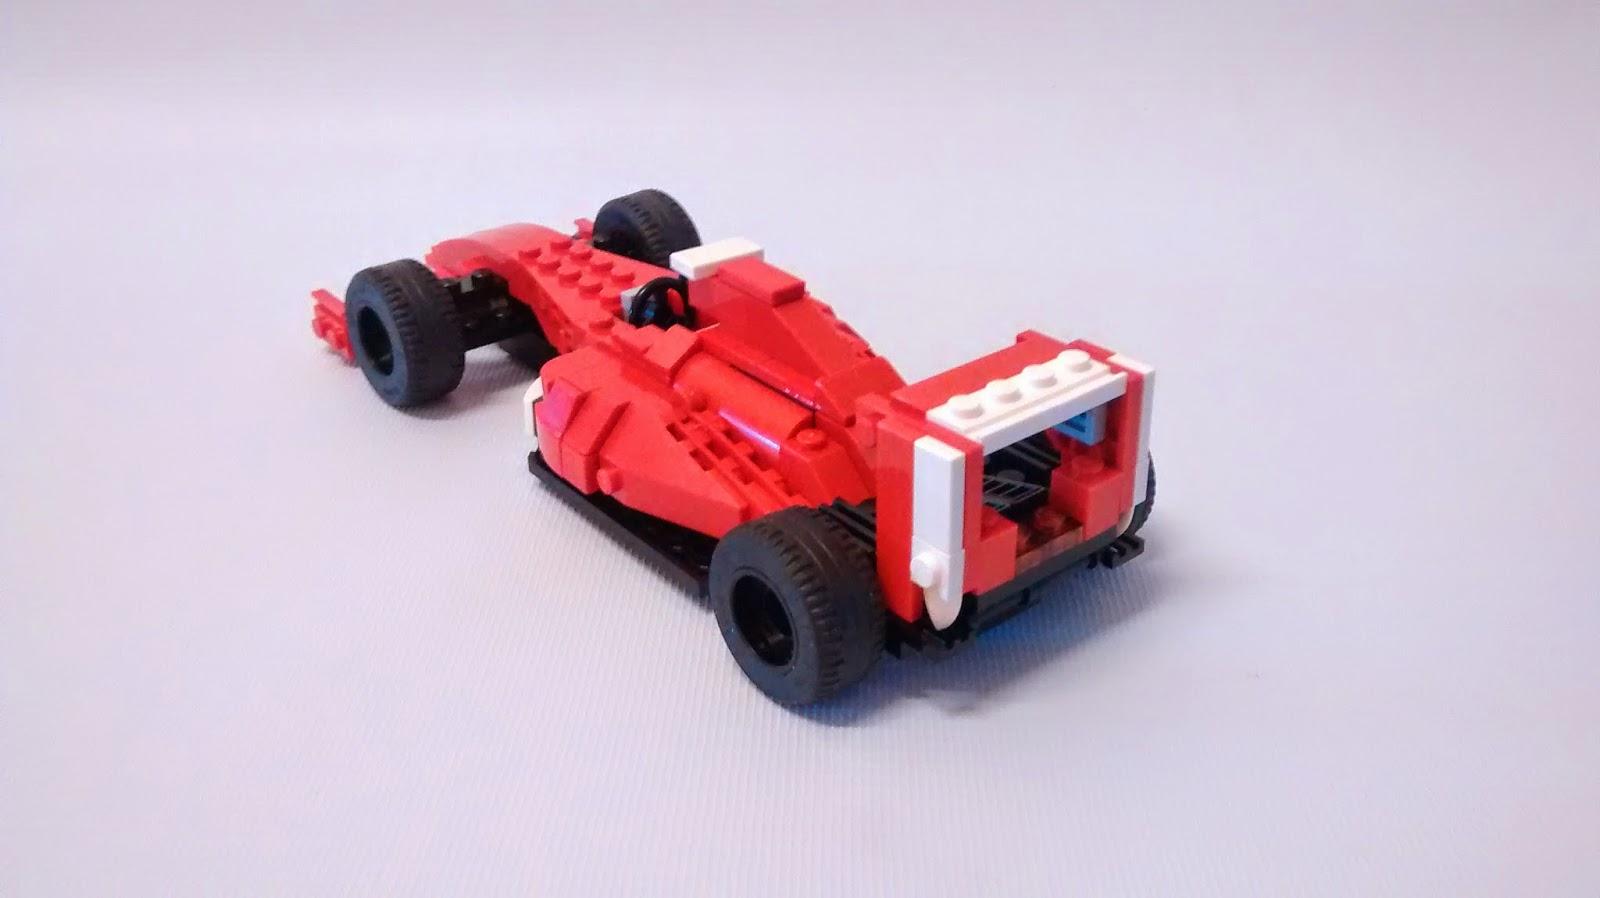 yoshiny 39 s design lego f1 31024 alternate build of ferrari formula 1 car. Black Bedroom Furniture Sets. Home Design Ideas